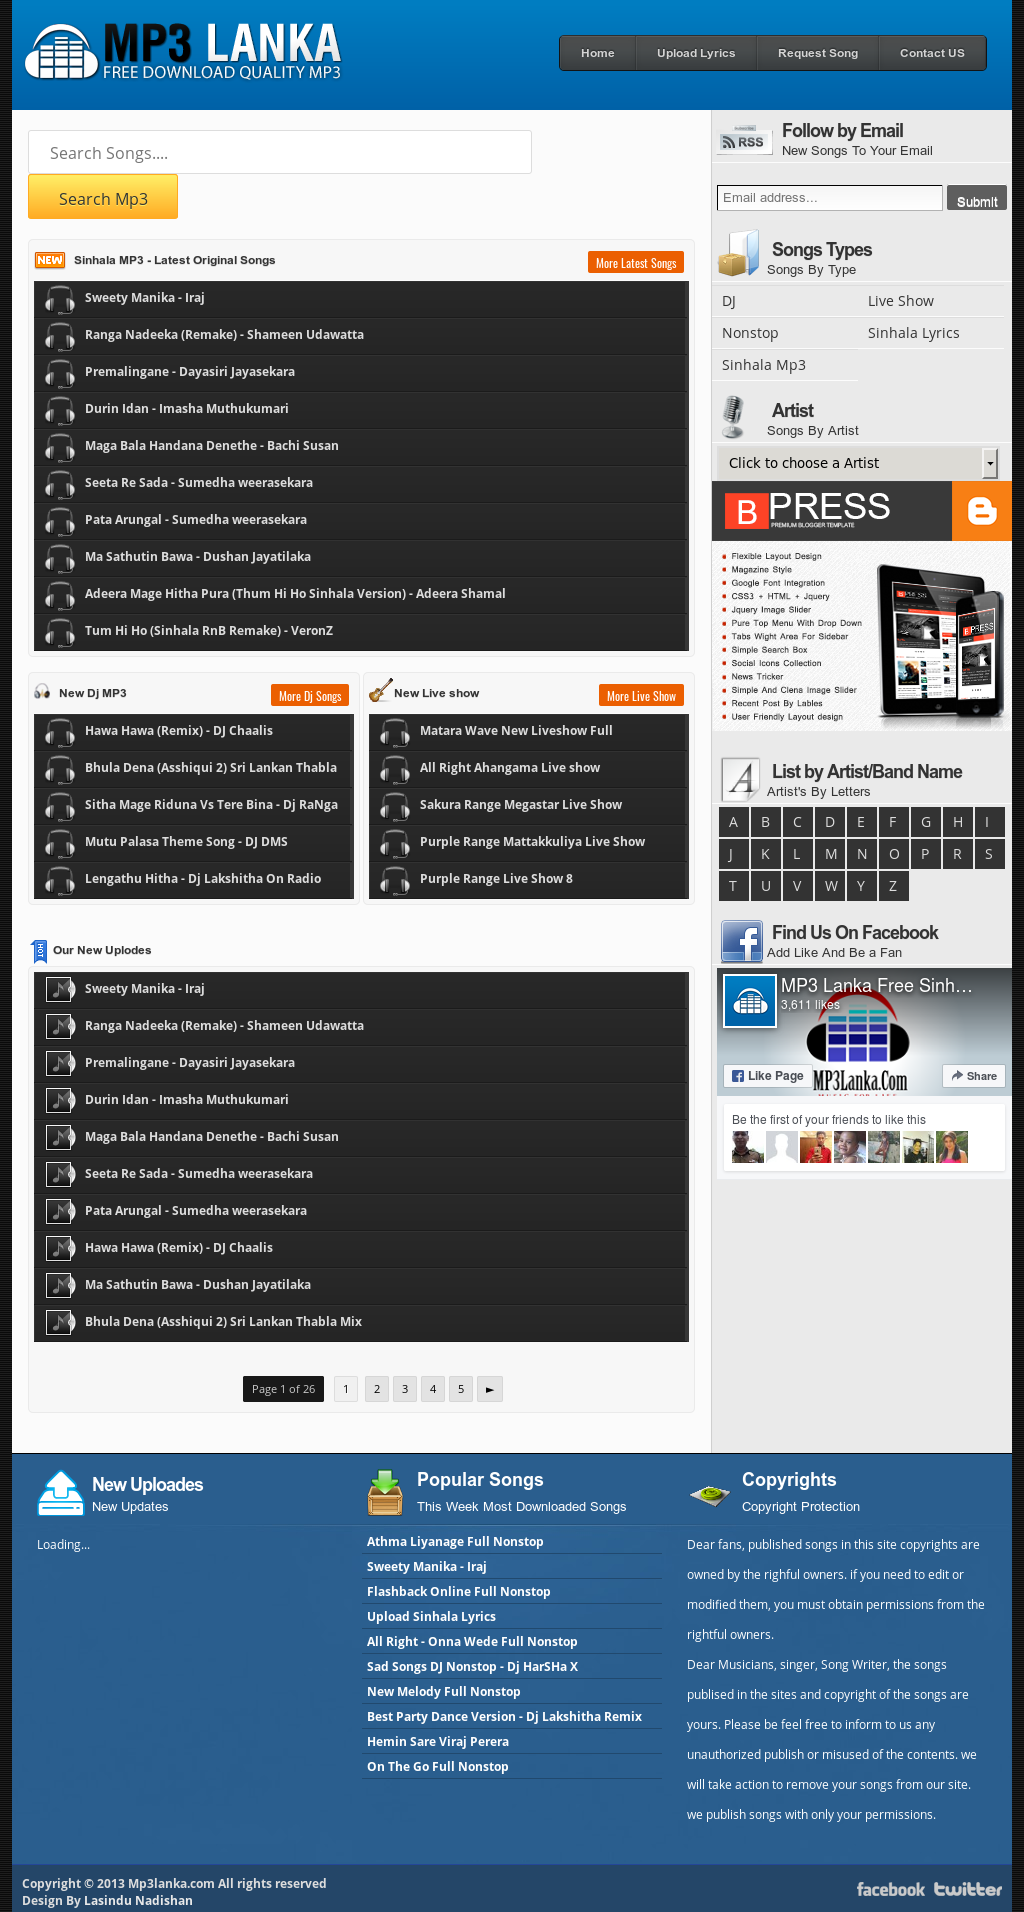 Mp3 Lanka Free Sinhala Songs With Sinhala Lyrics Competitors